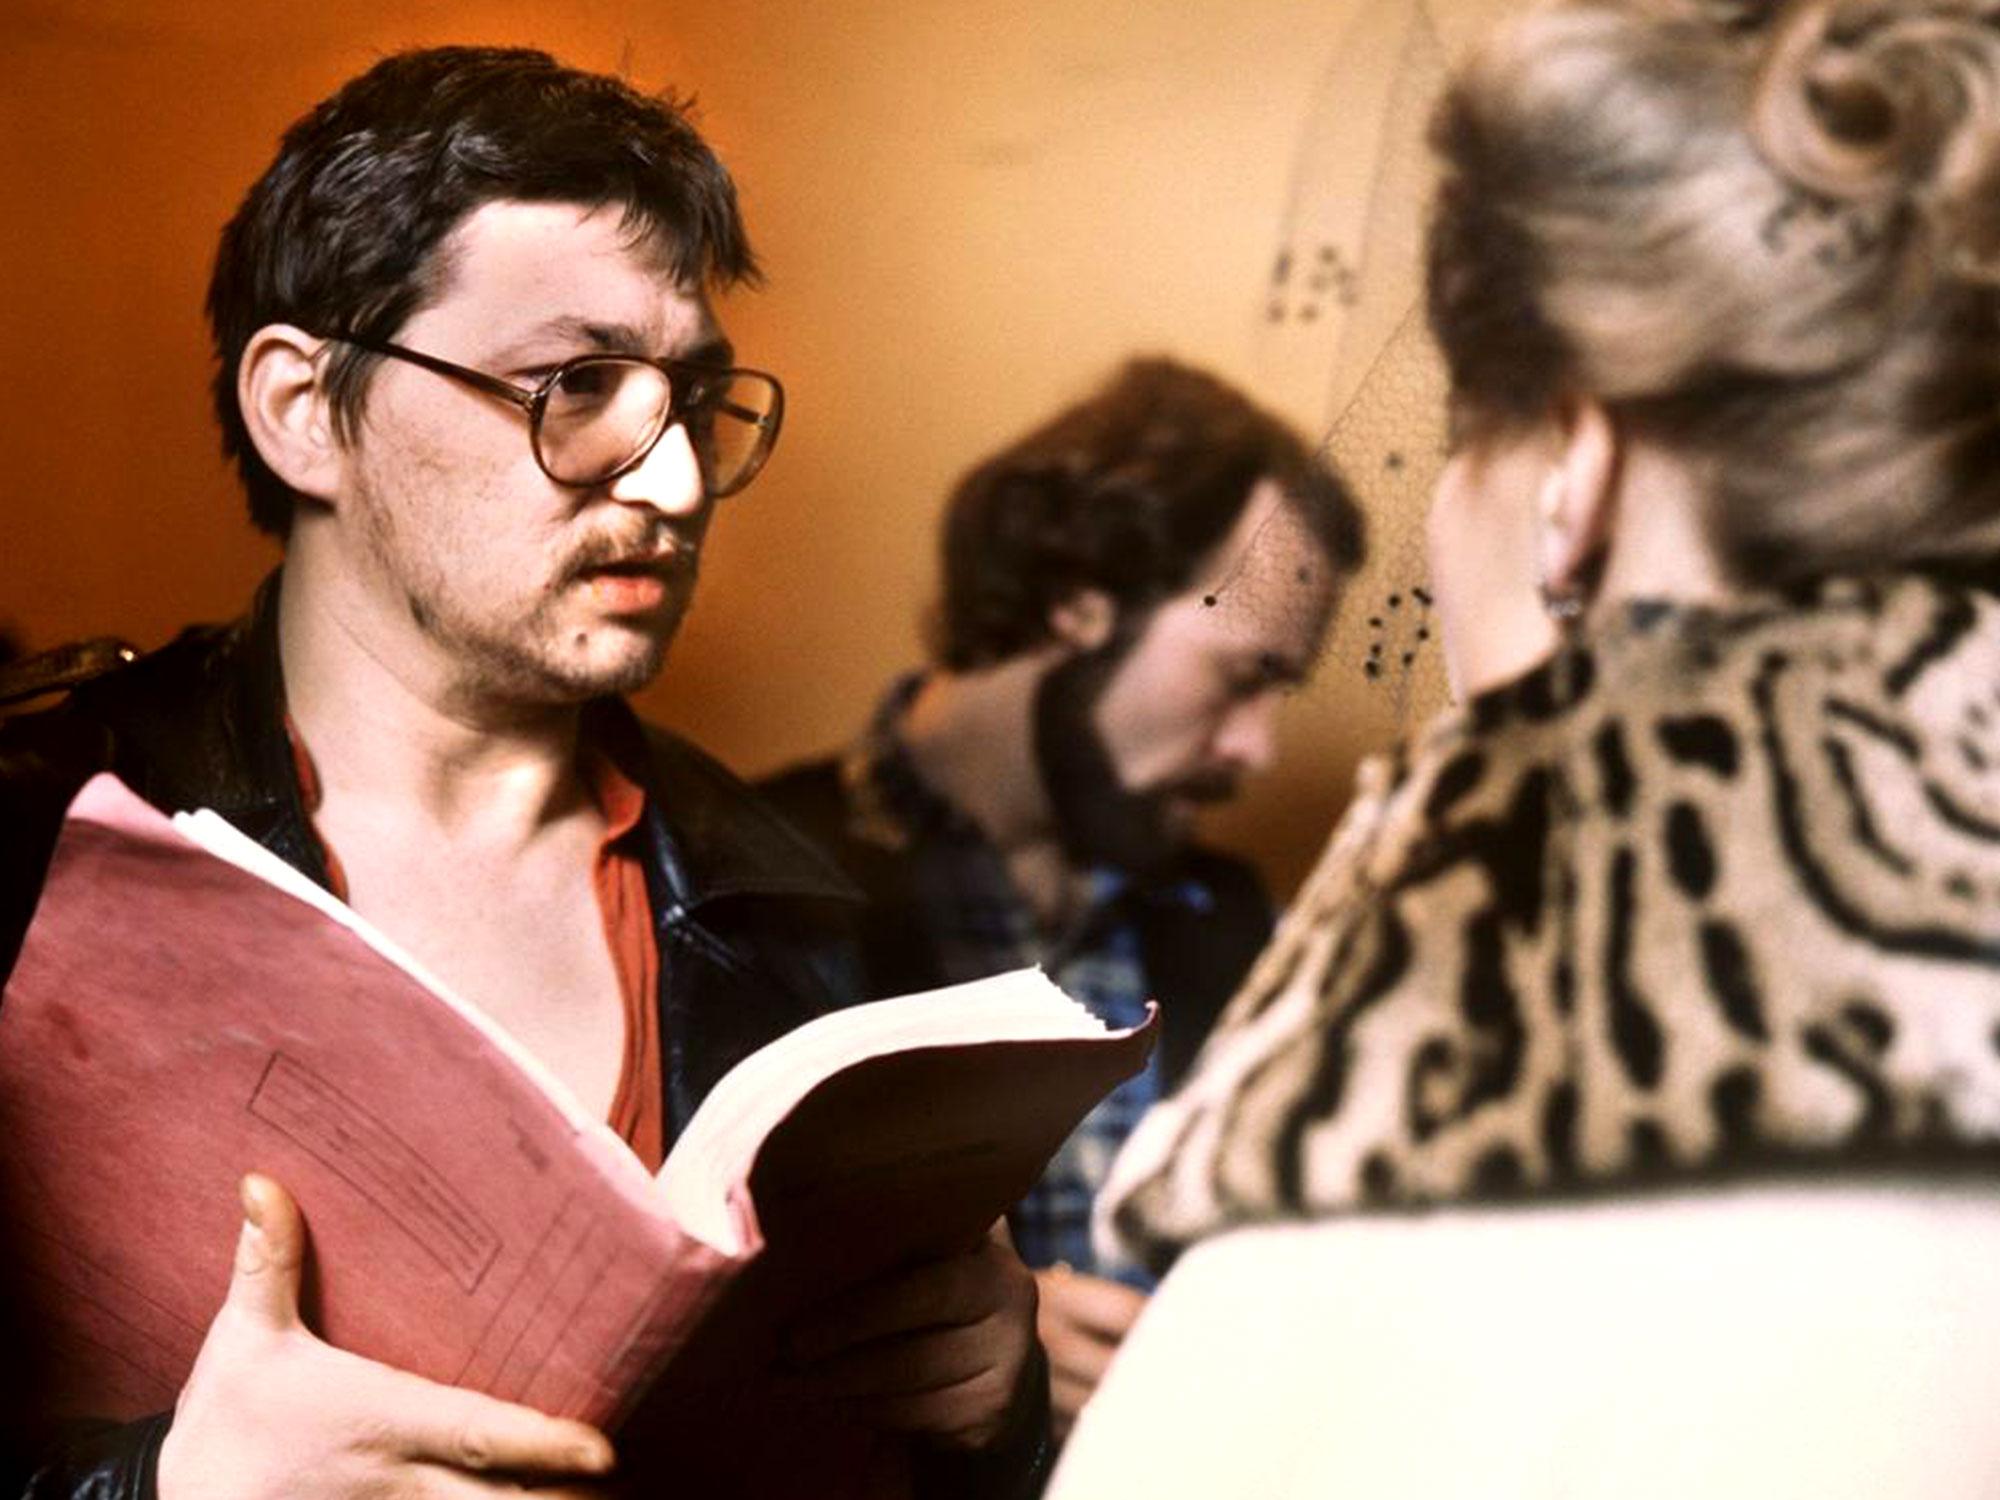 https://lwlies.com/wp-content/uploads/2017/04/Rainer-Werner-Fassbinder-30-Todestag.jpg